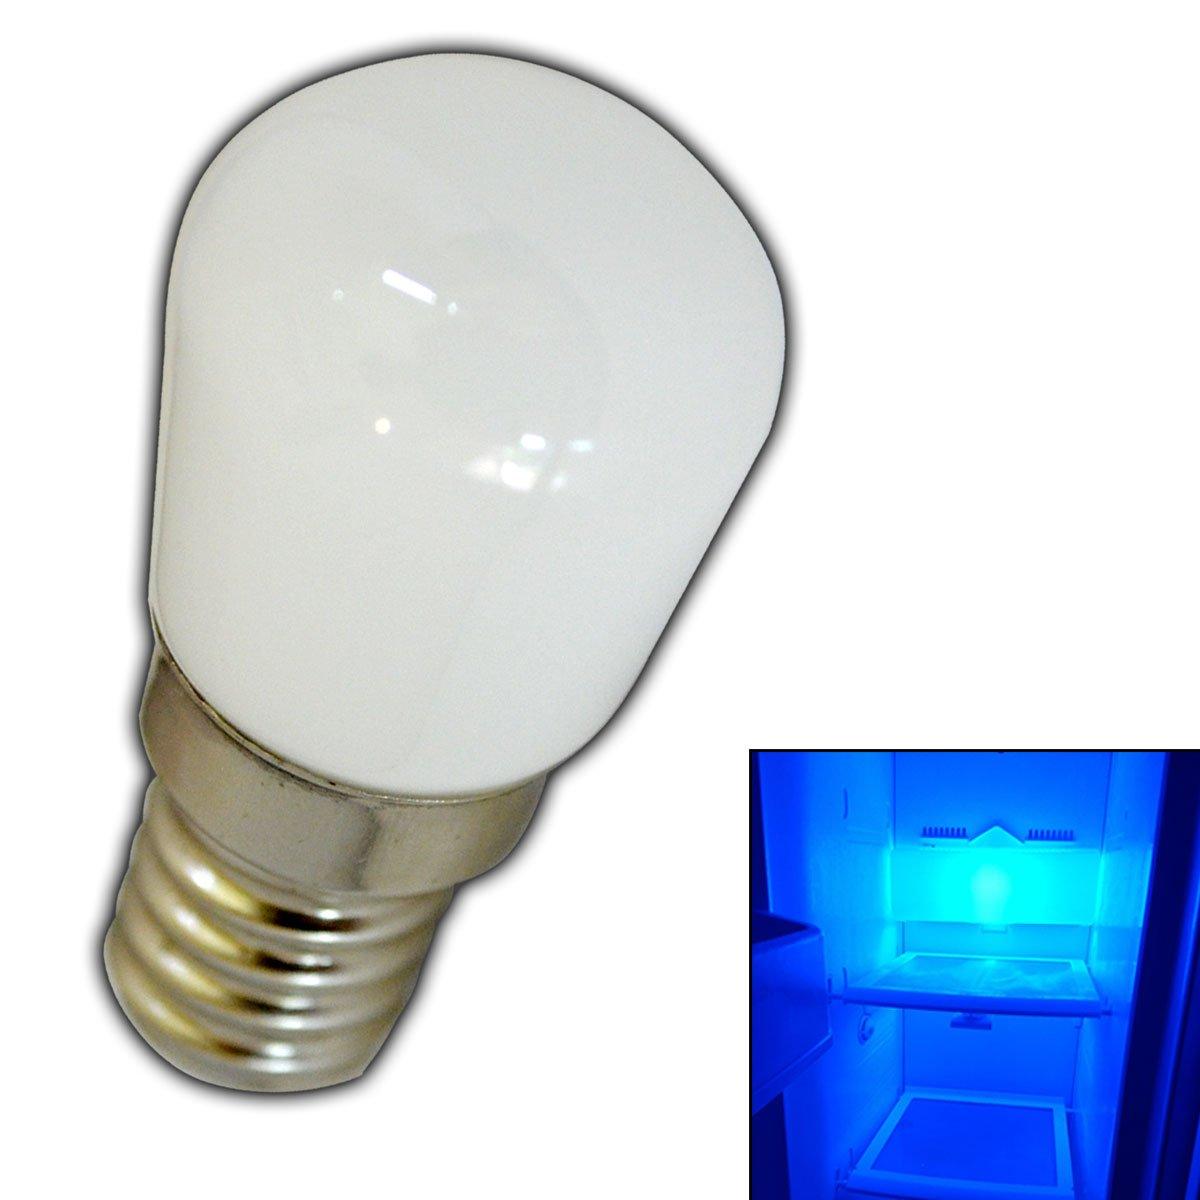 E14 led lampe 15 watt blau blaulicht fr den khlschrnke e14 led lampe 15 watt blau blaulicht fr den khlschrnke lampen uvm e14ses leuchtmittel khlschrank birne glhbirne ersatz amazon beleuchtung parisarafo Images